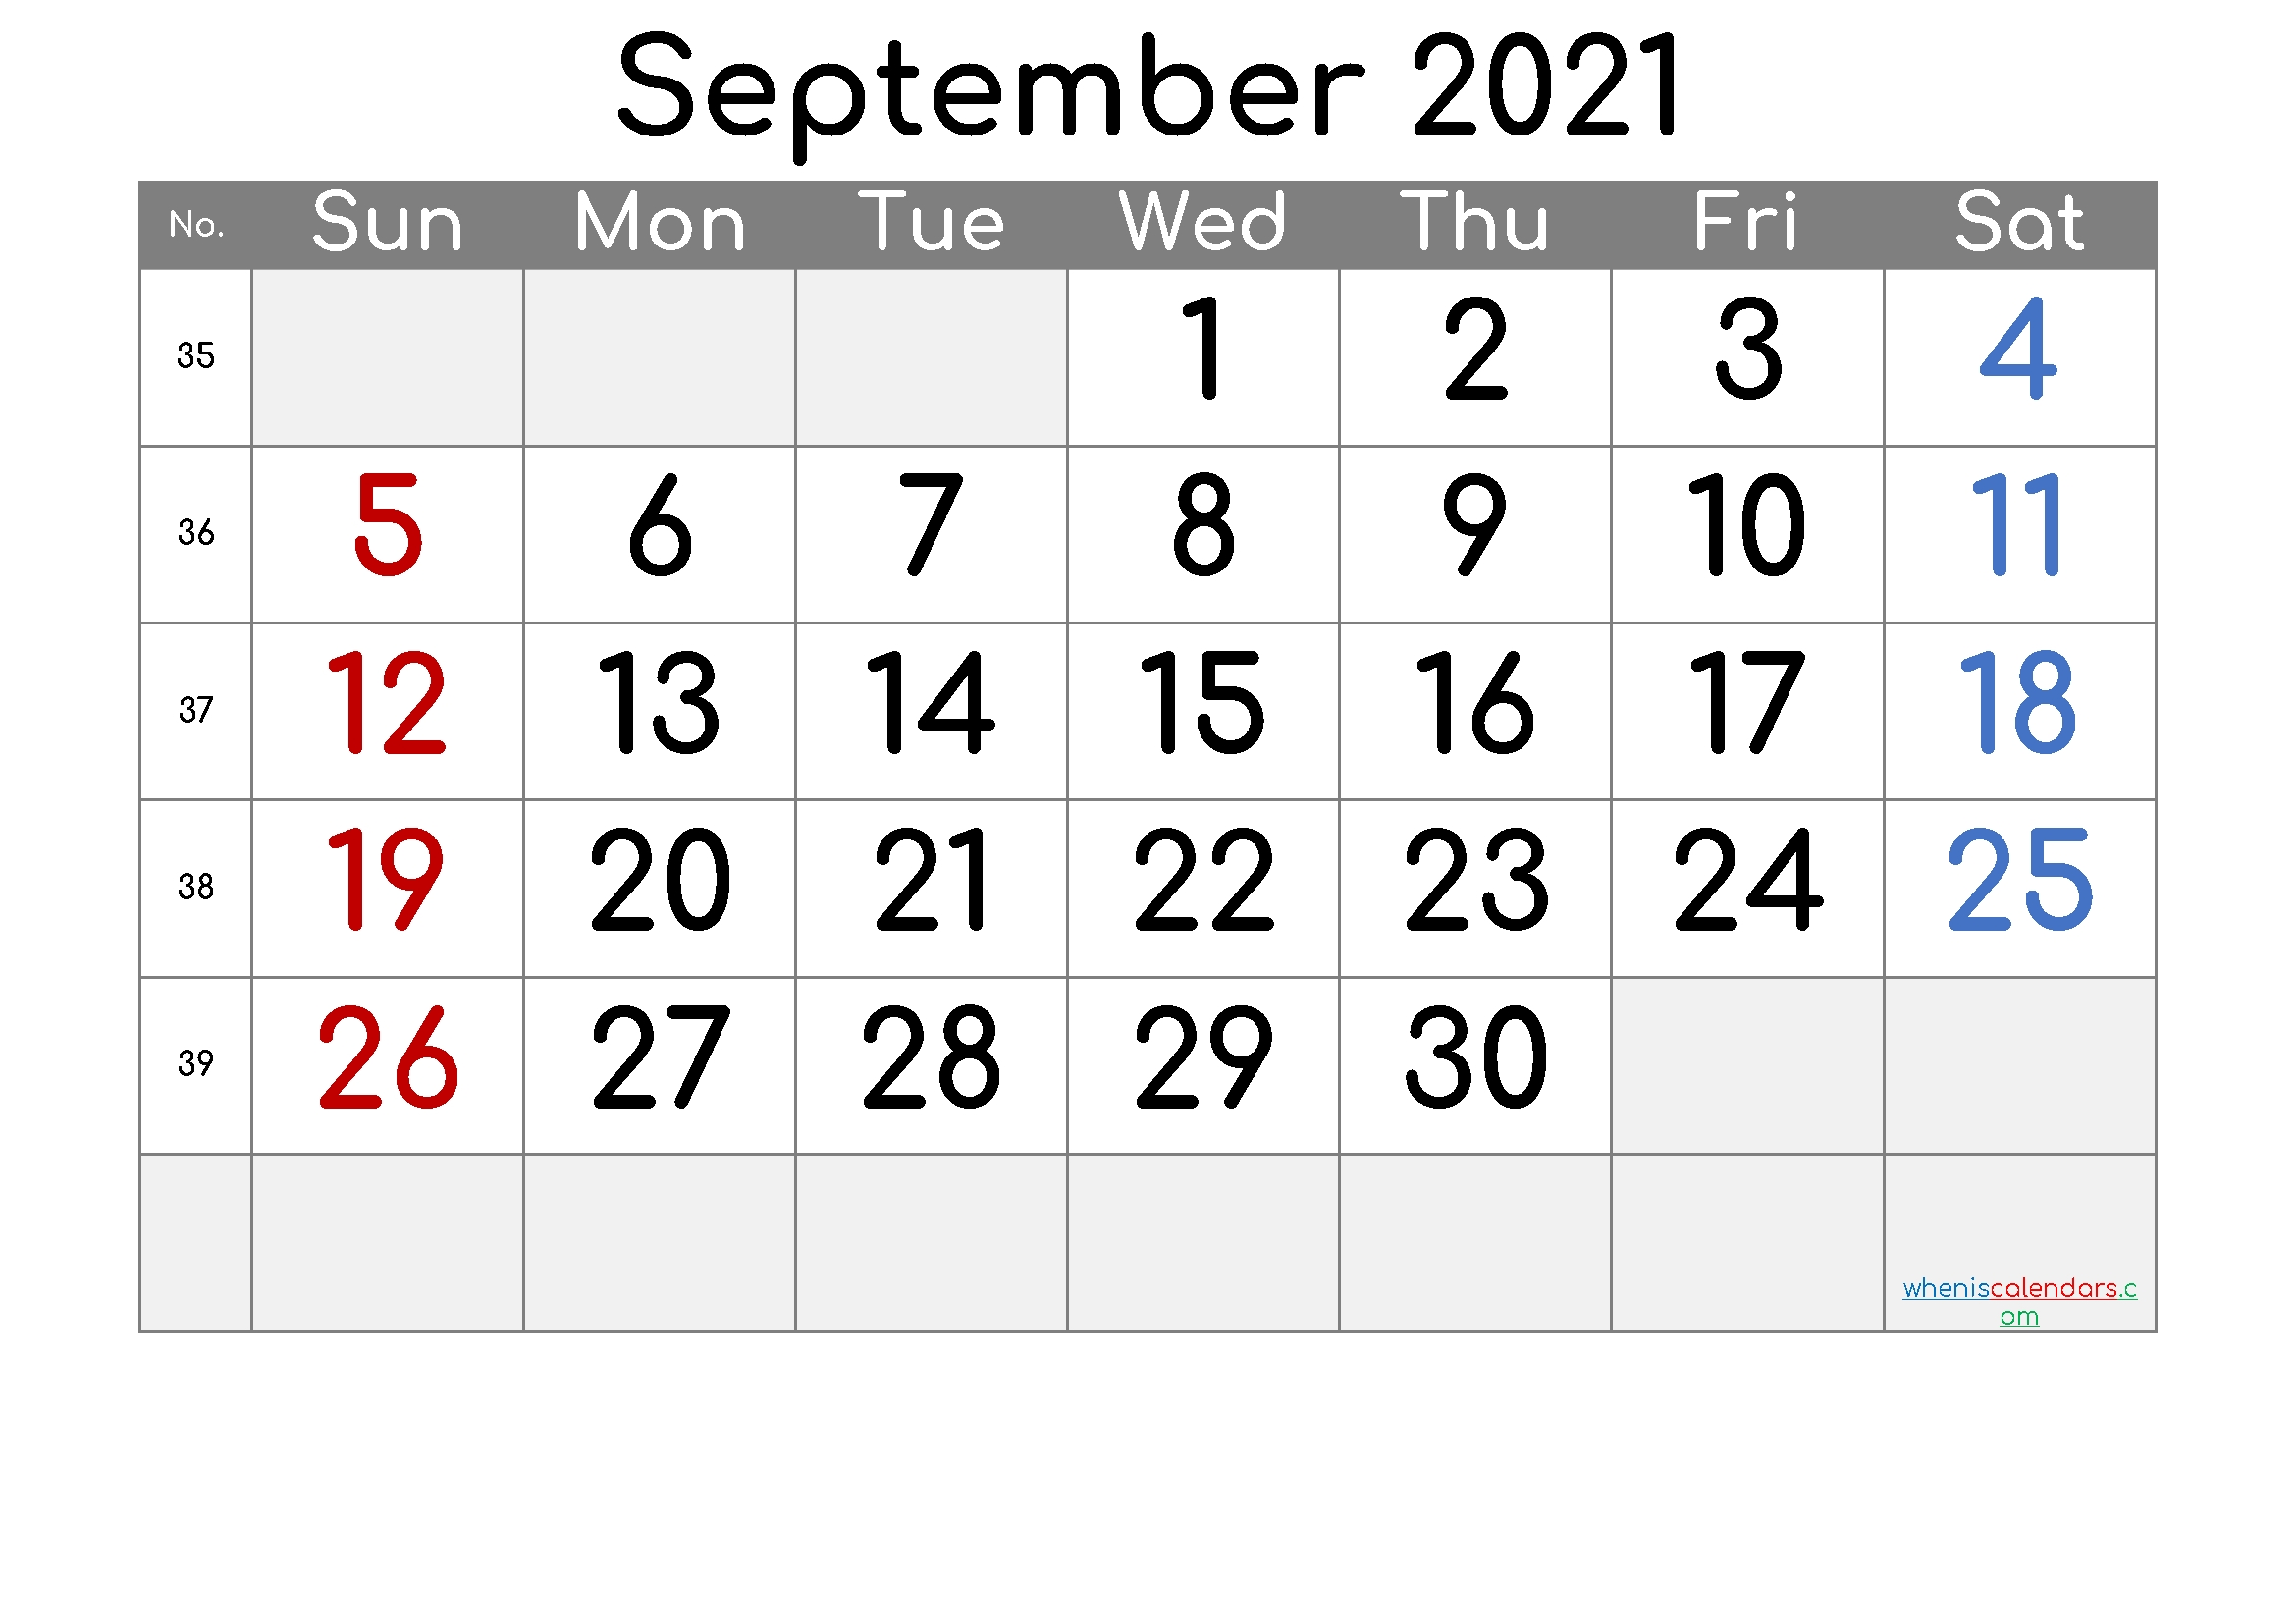 Free Printable Calendar 2021 September - 6 Templates 2021 Calendar September Month